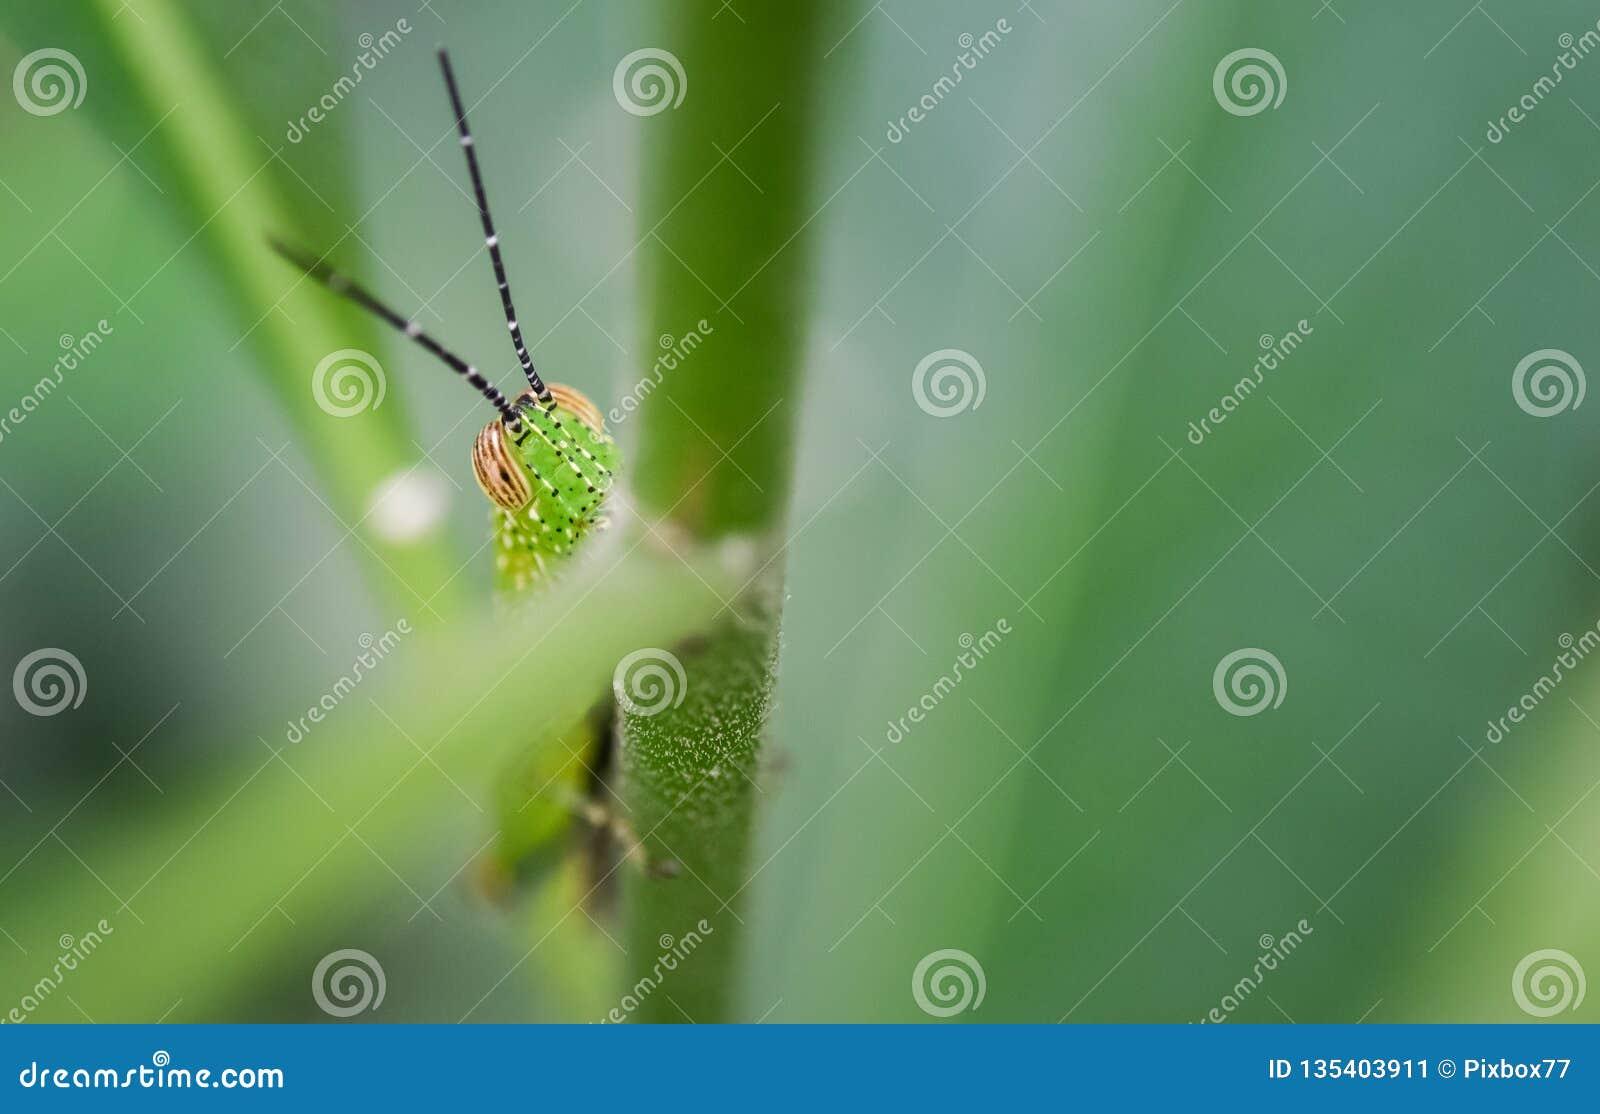 Тайник кузнечика на зеленых лист